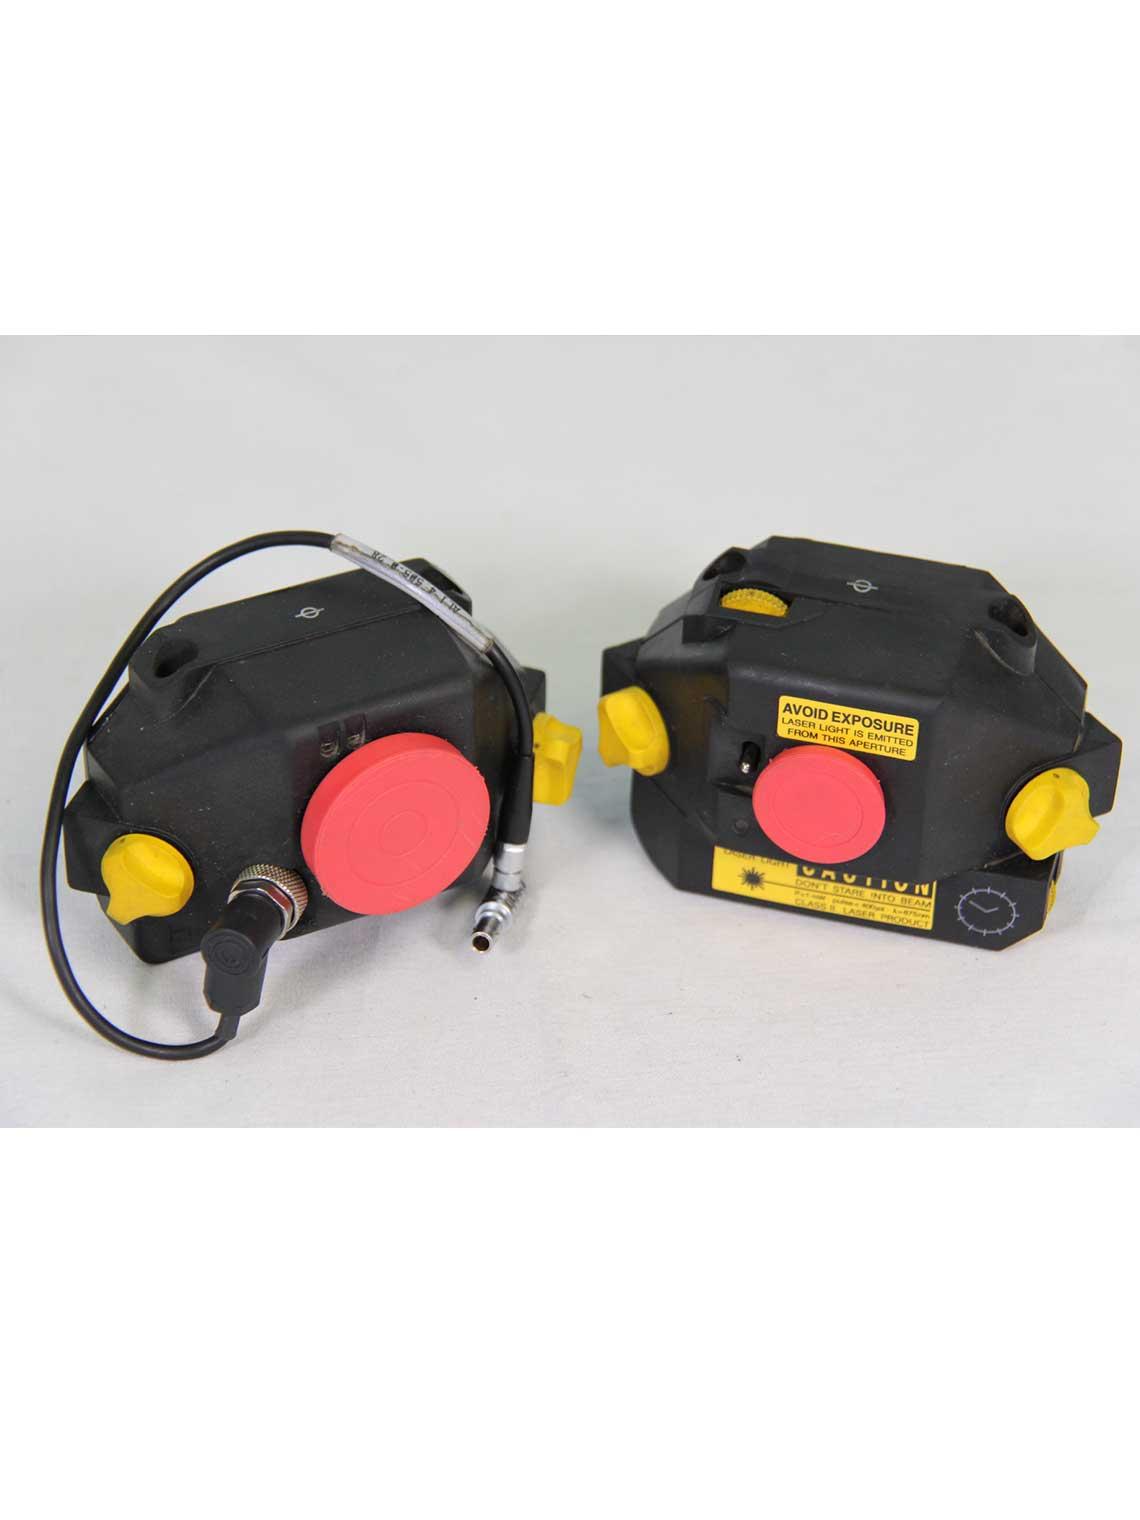 rotalign-ultra-laser-receiver